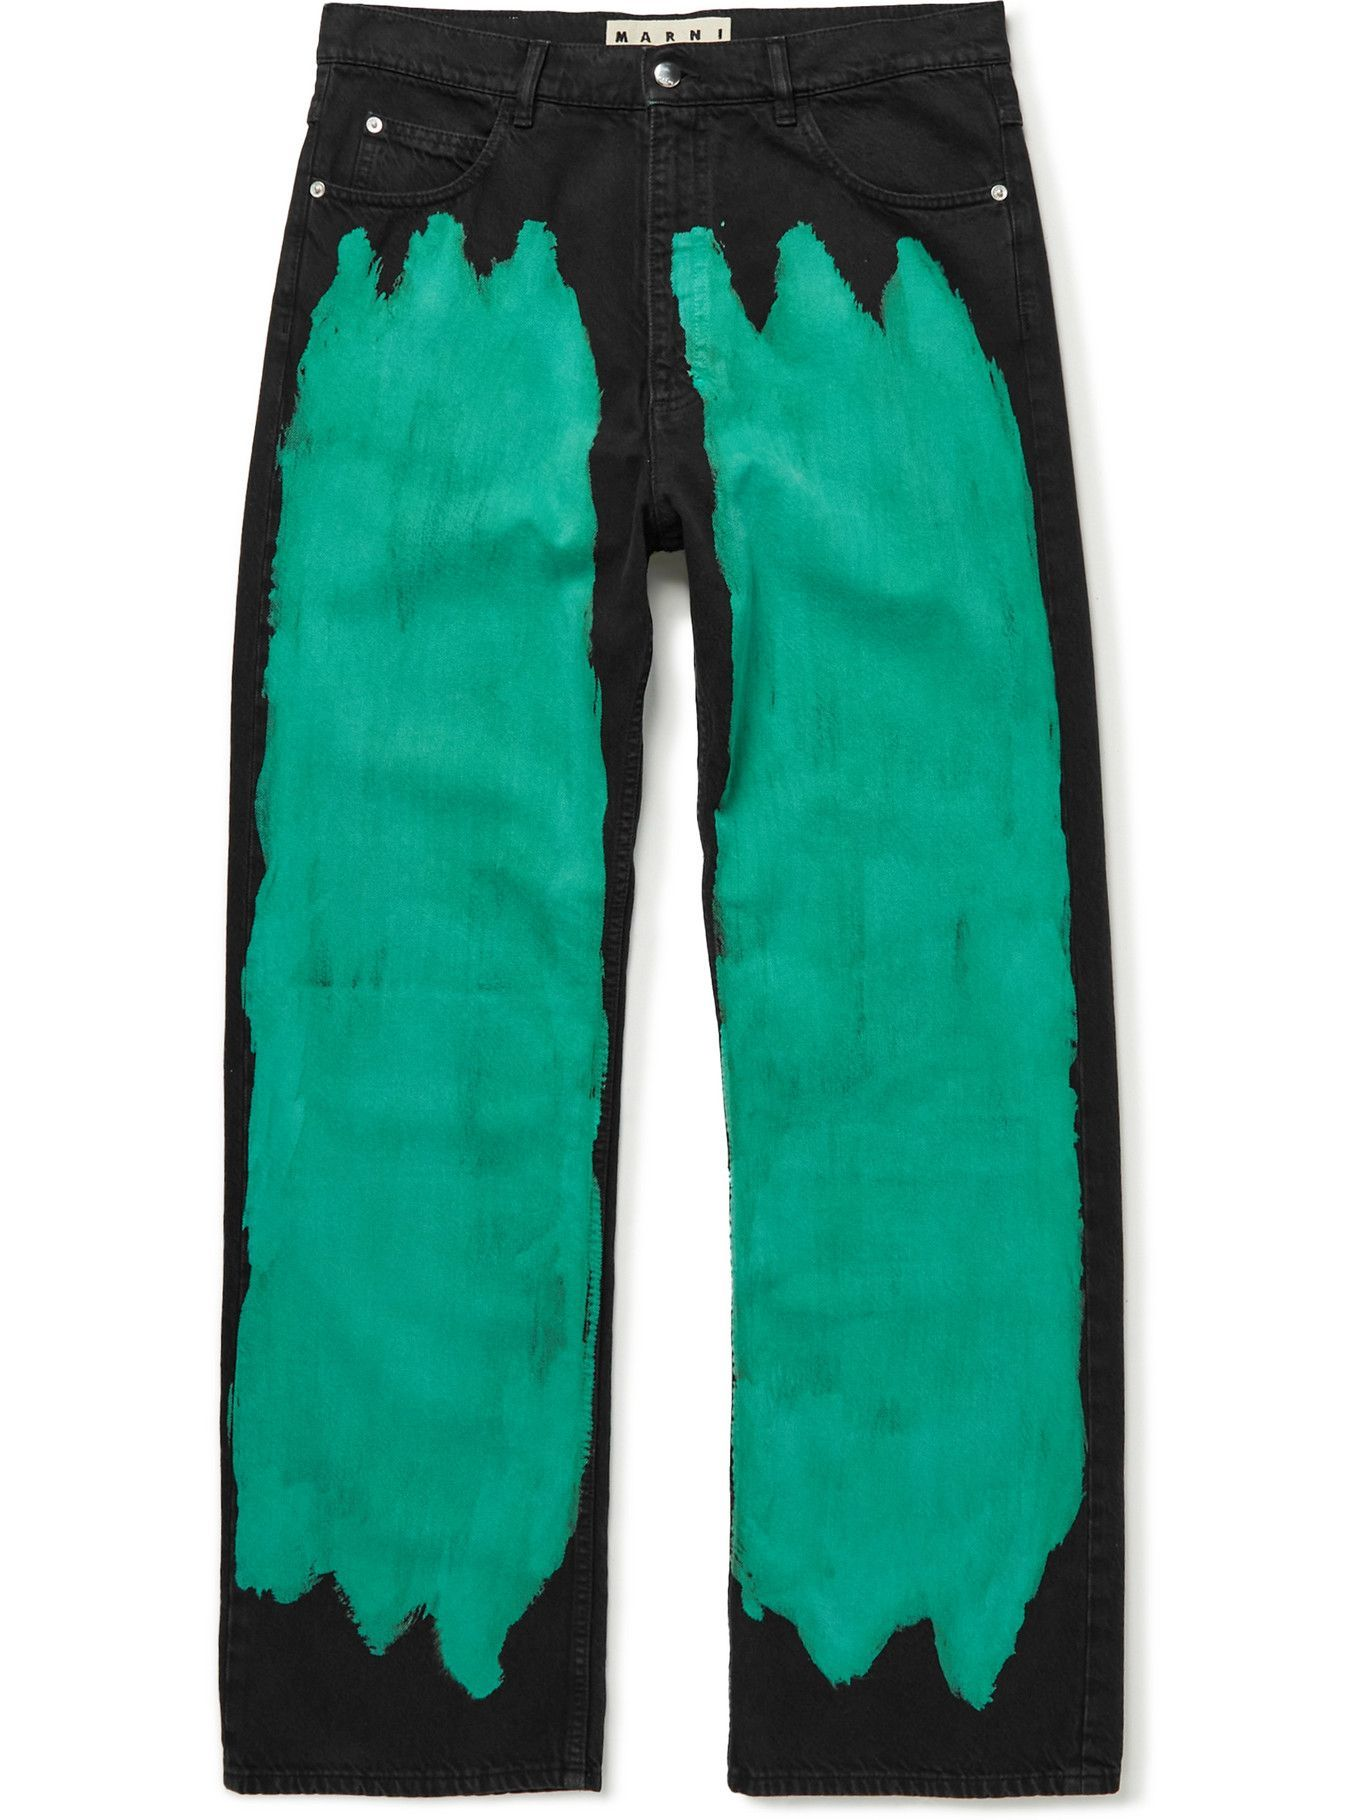 Marni - Bleached Denim Jeans - Green